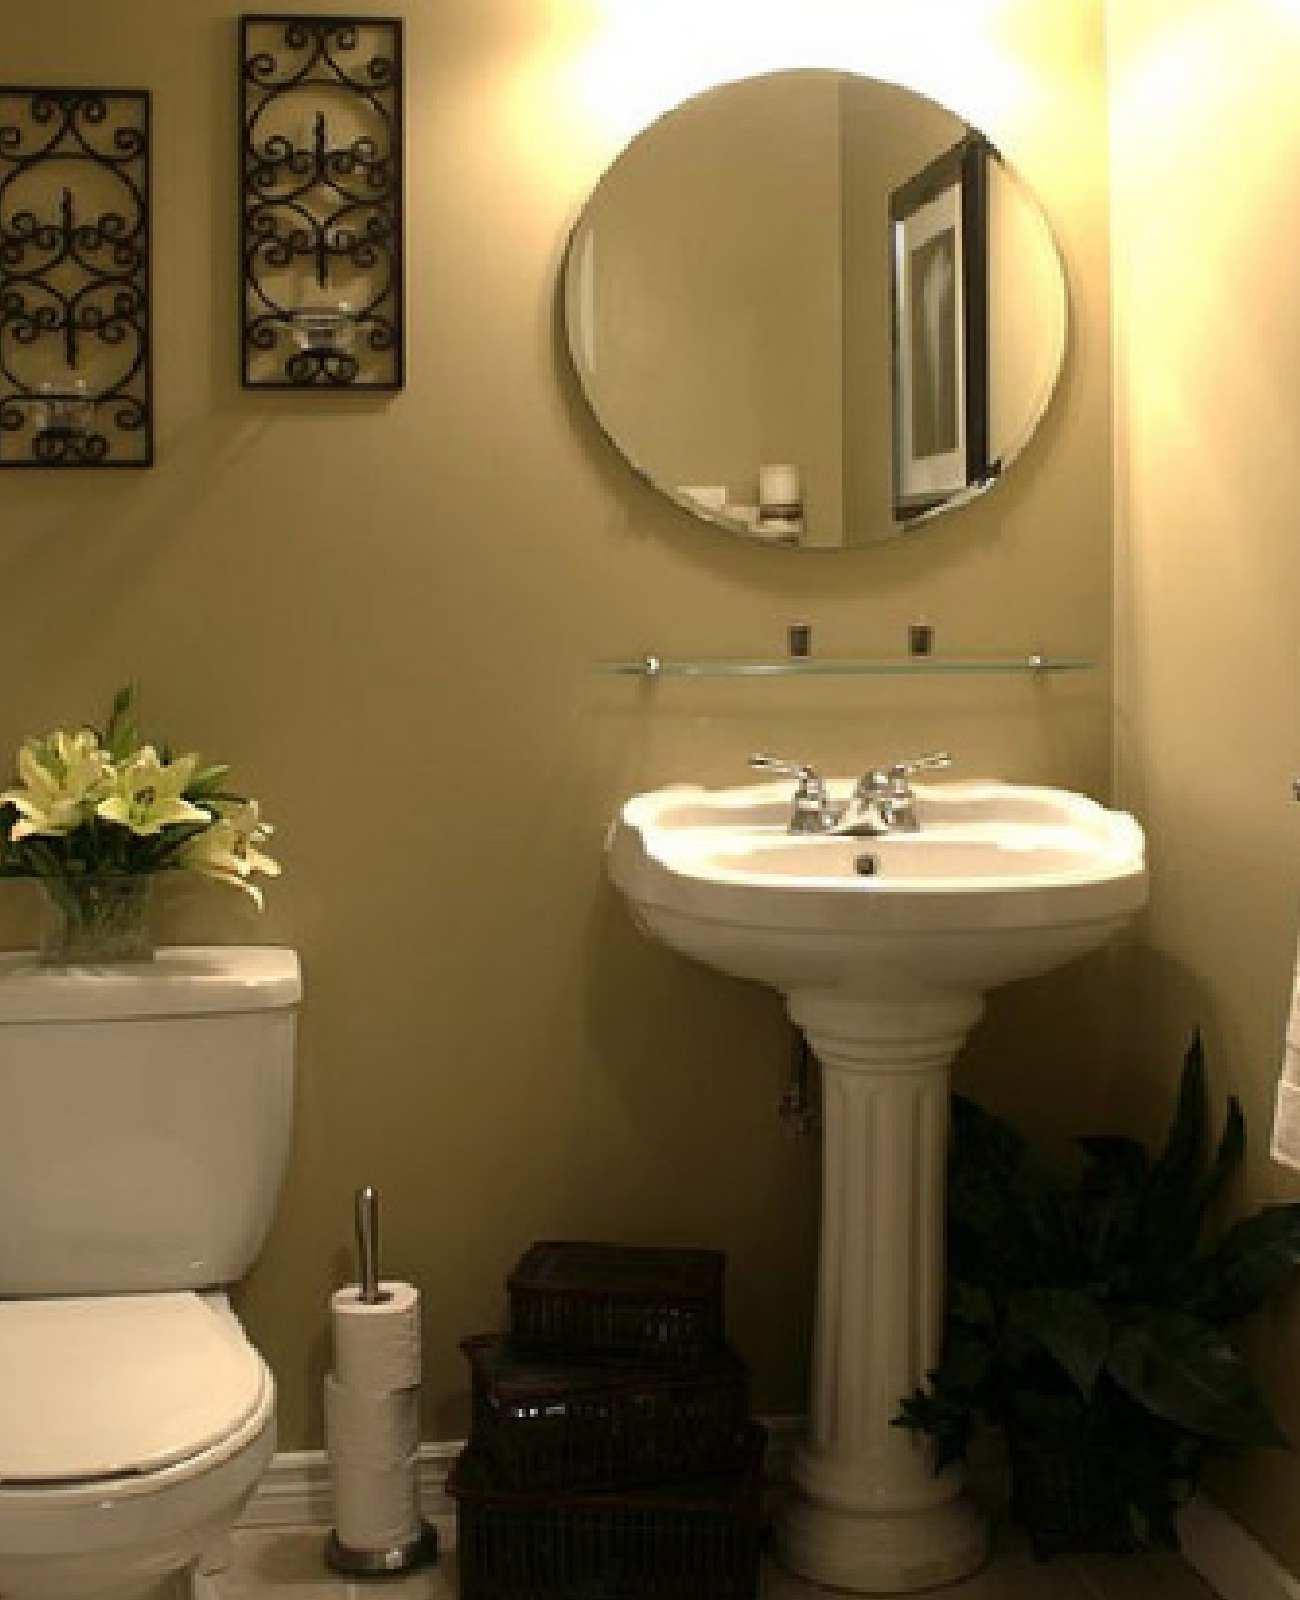 dazzling-small-bathroom-pleasing-small-bathroom-ideas-2-home-also-dazzling-small-bathroom-design-ideas-bathroom-images-small-bathroom-ideas